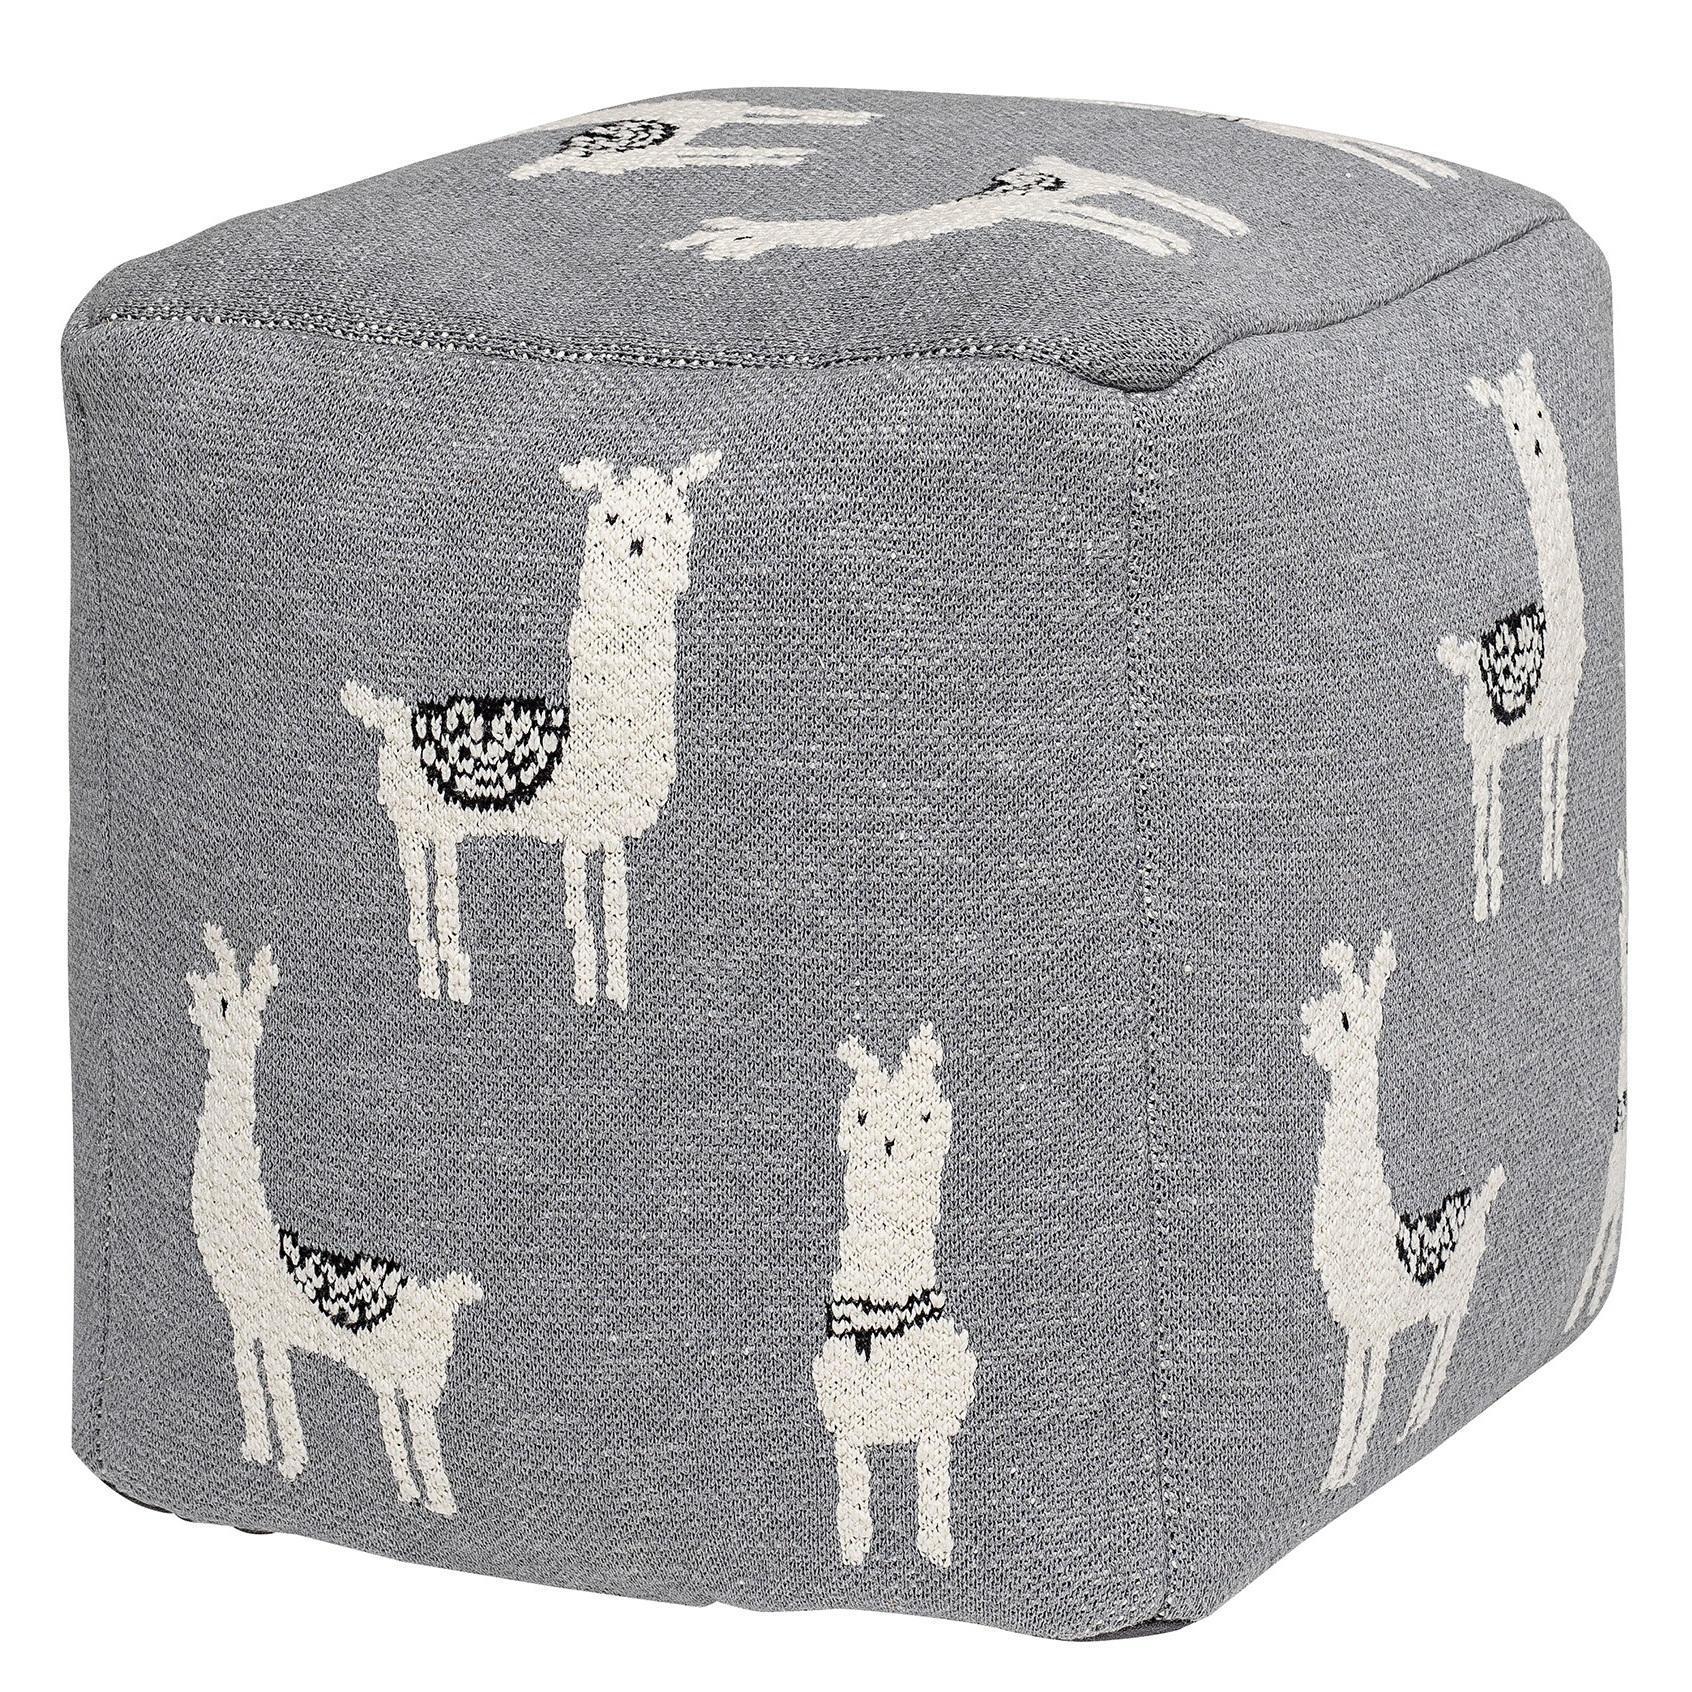 Bloomingville Dětský taburet Grey Llama, šedá barva, textil